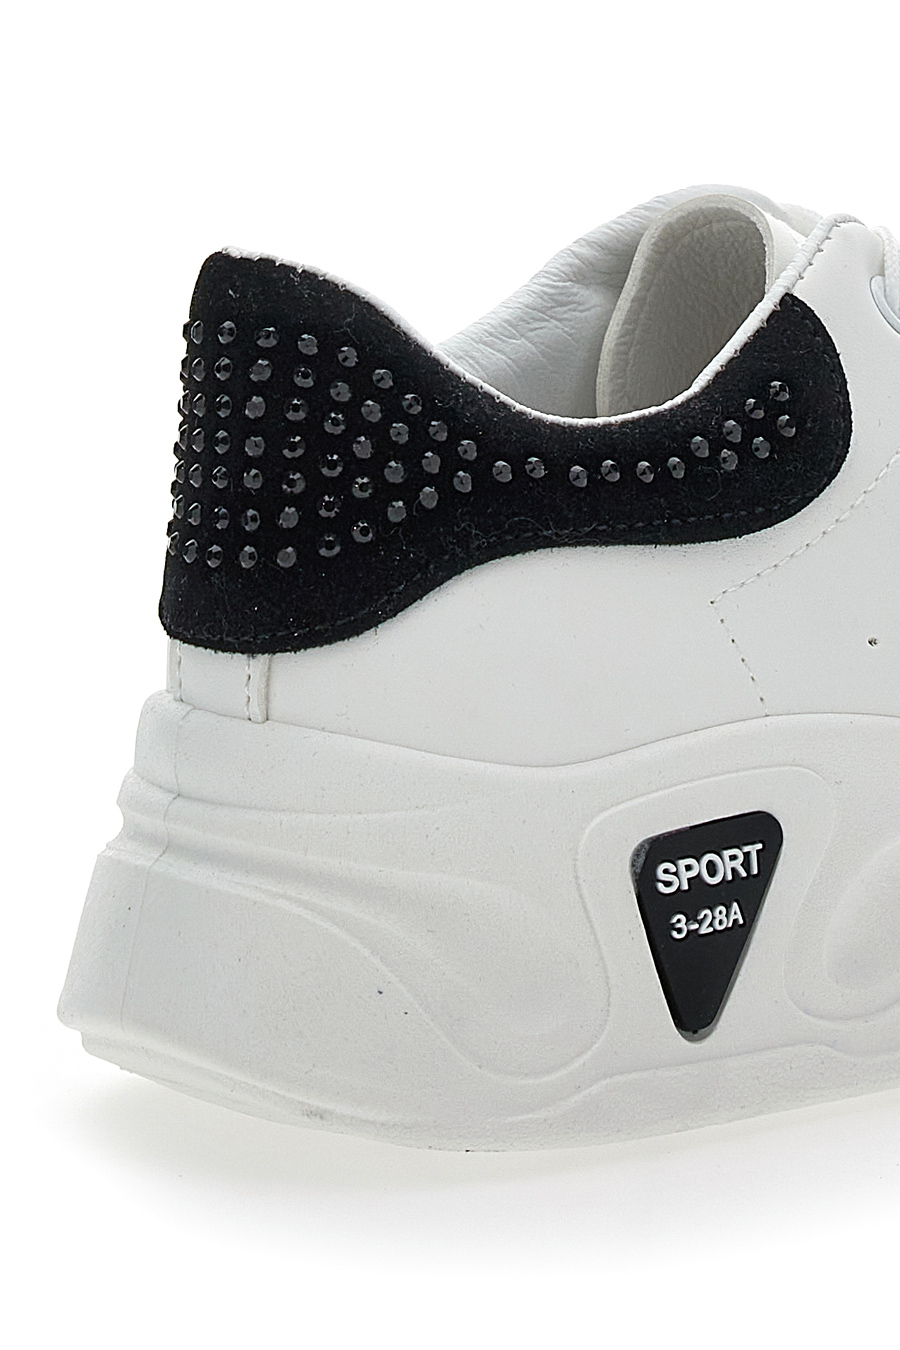 SNEAKERS PUSHY WAMP 6603 donna bianco/nero | Pittarello